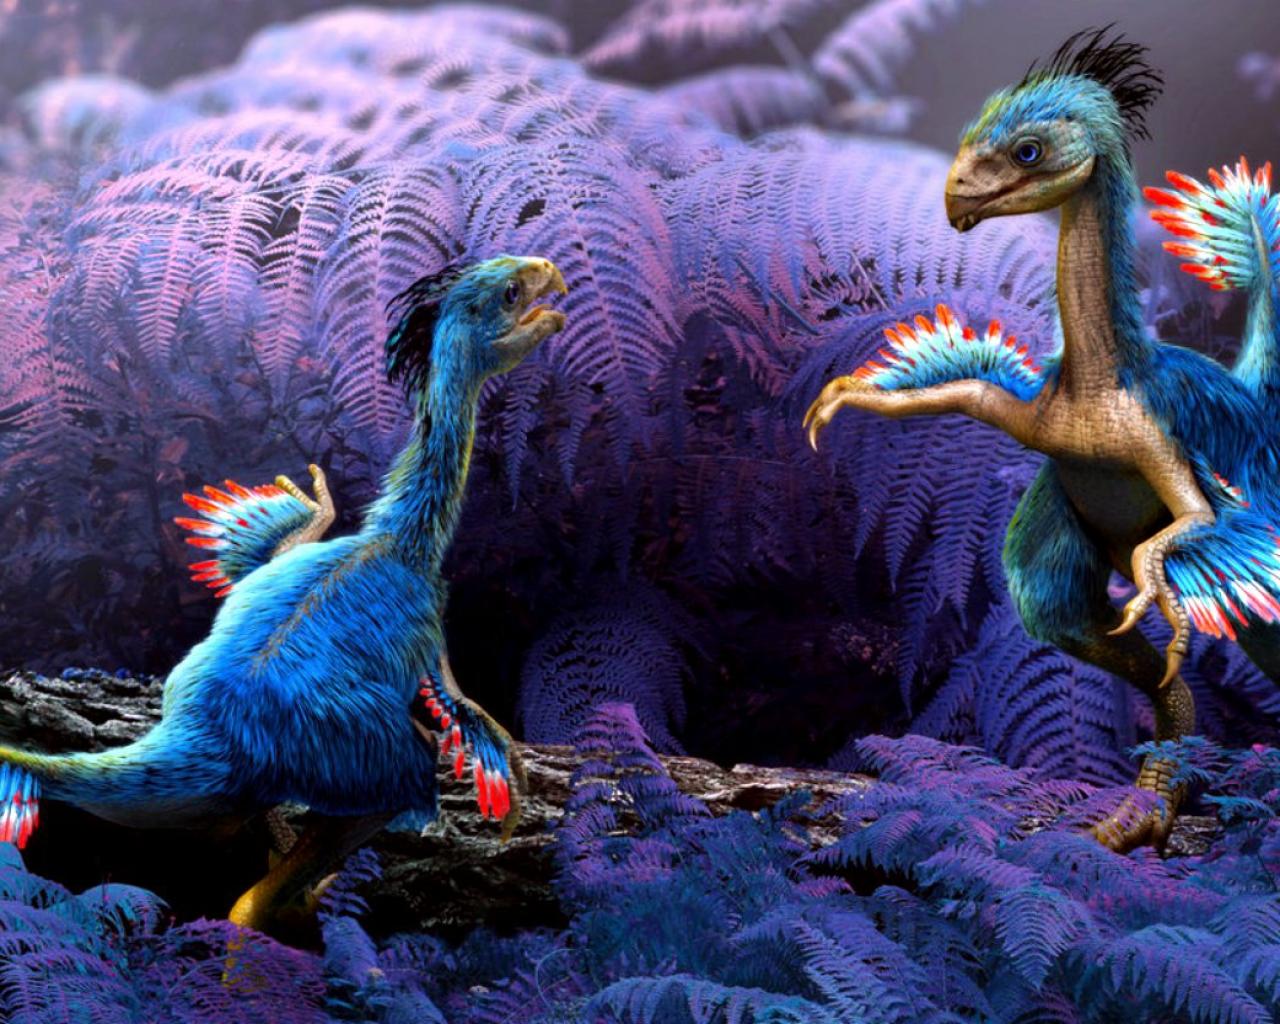 Free Download Dinosaur Wallpaper 3d 3d Dinosaurs Wallpapers